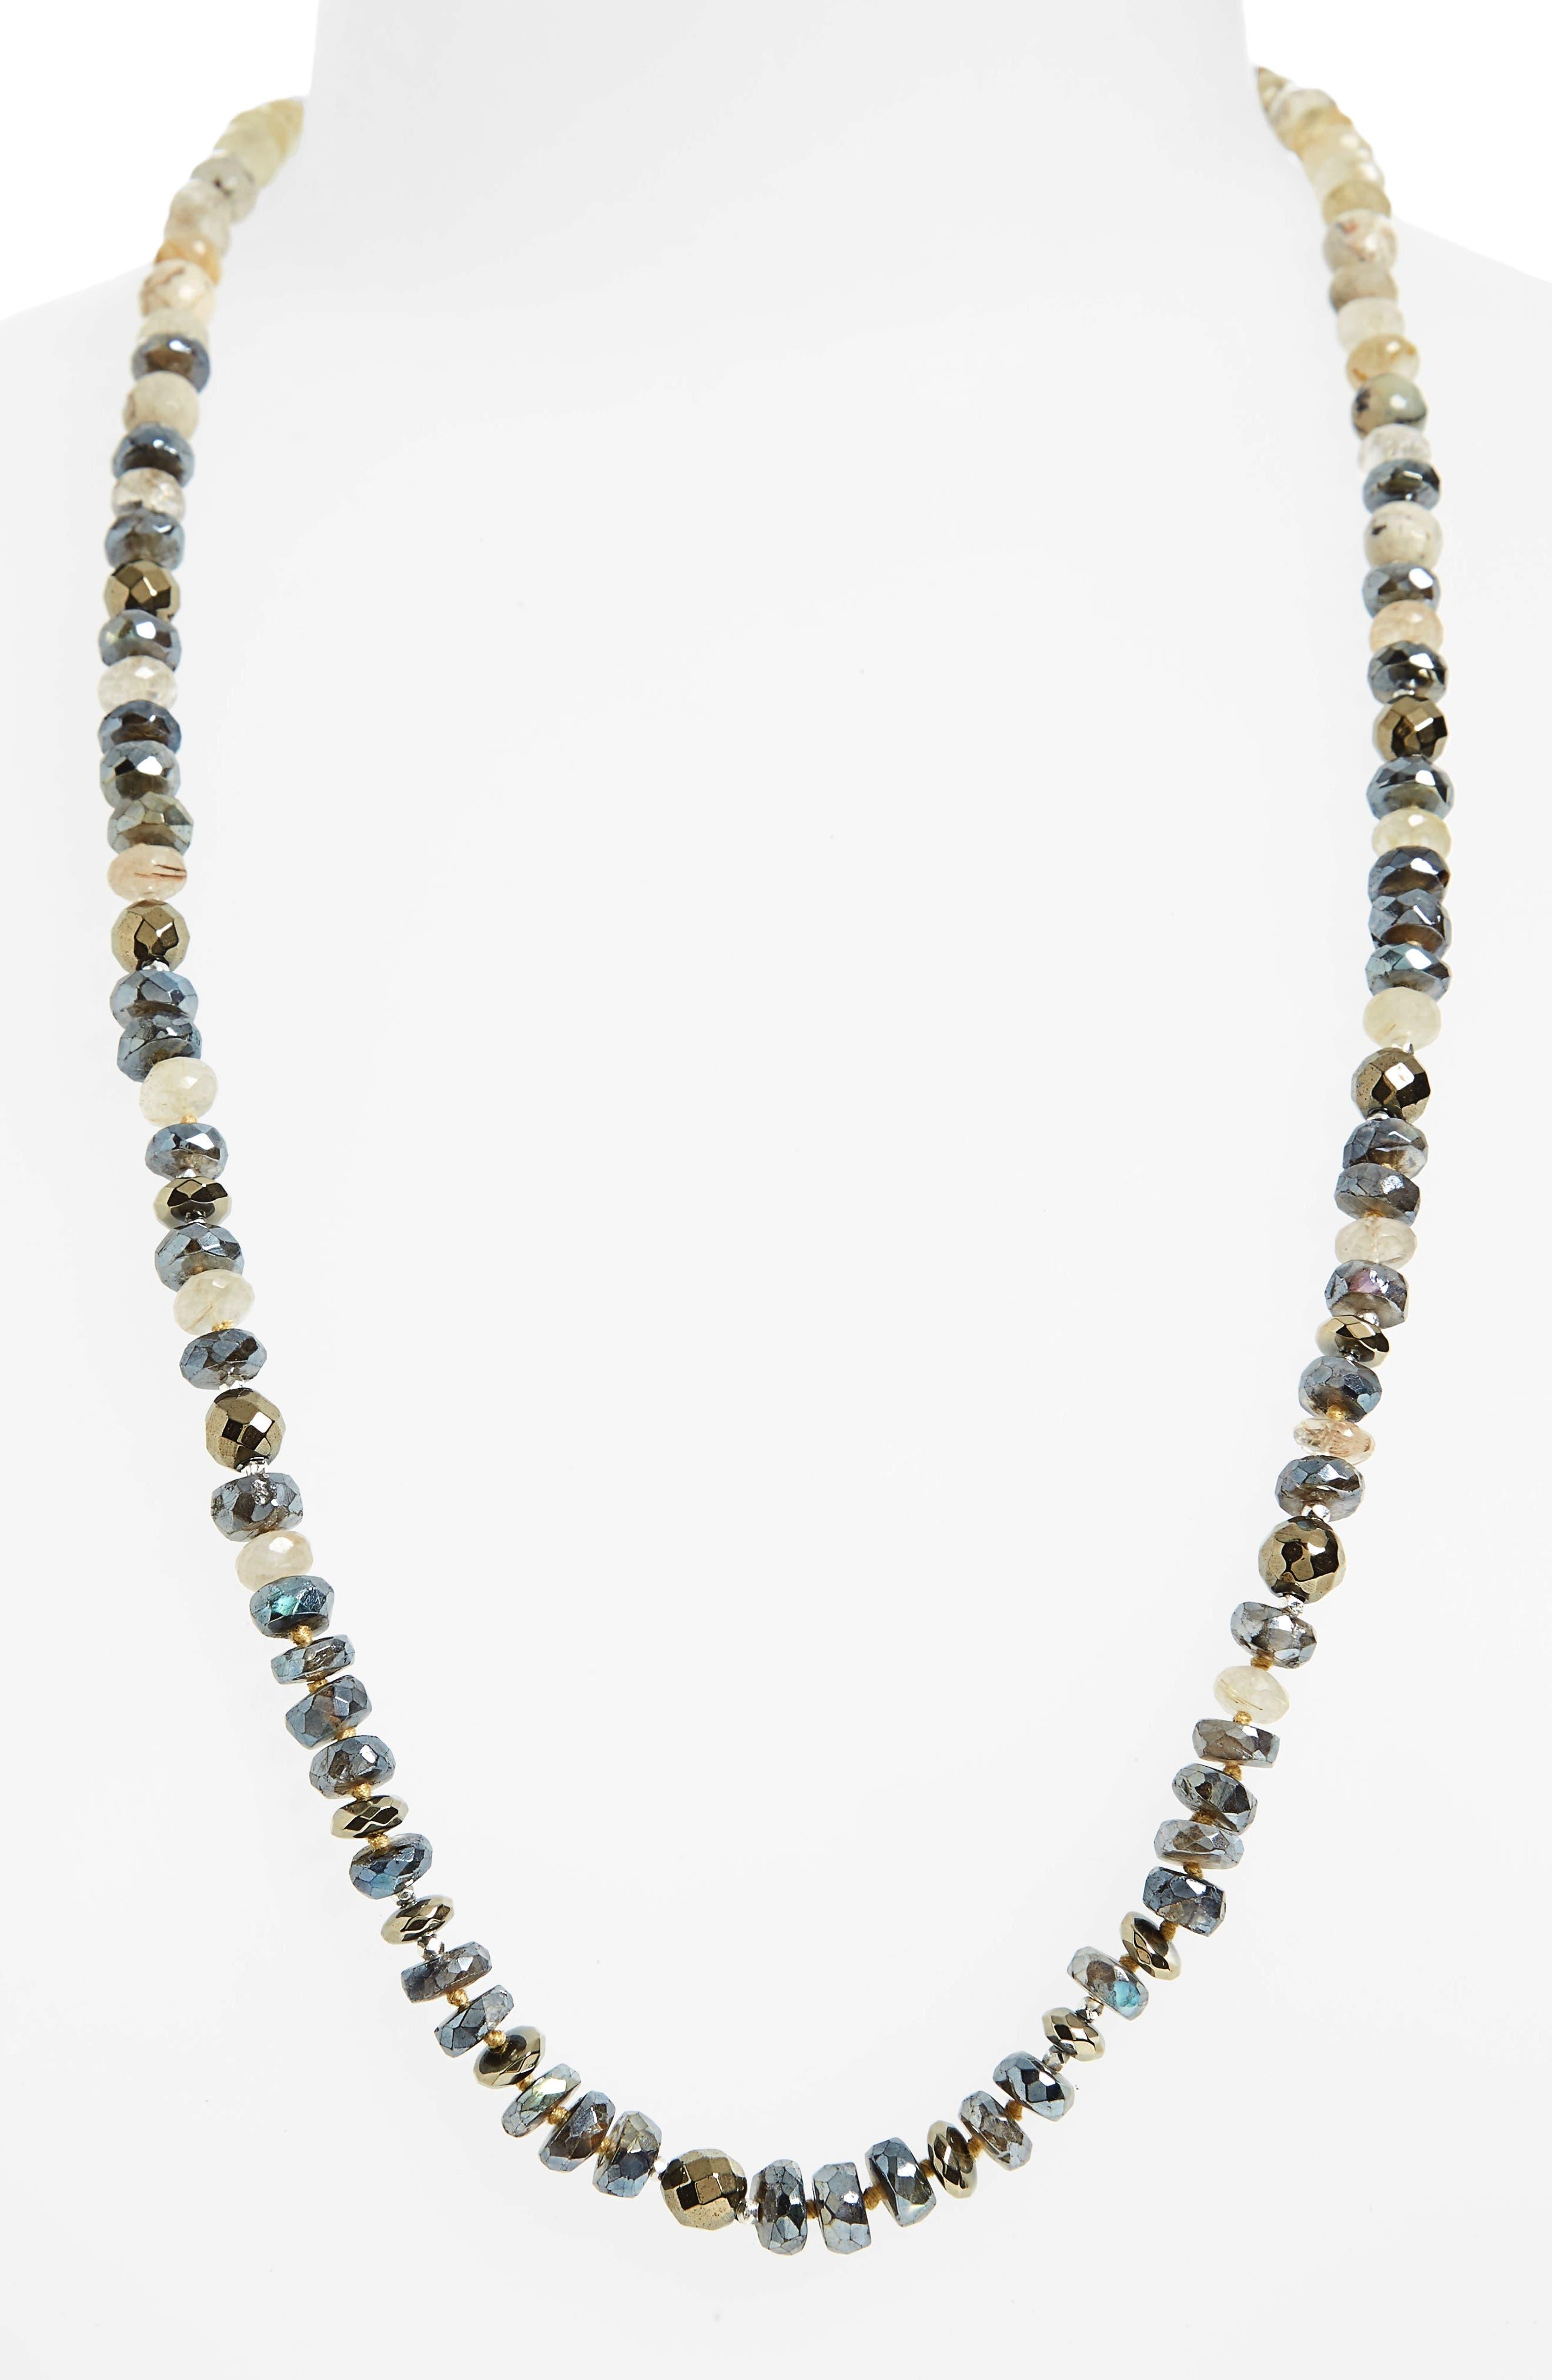 Main Image - Chan Luu Semiprecious Stone Adjustable Necklace